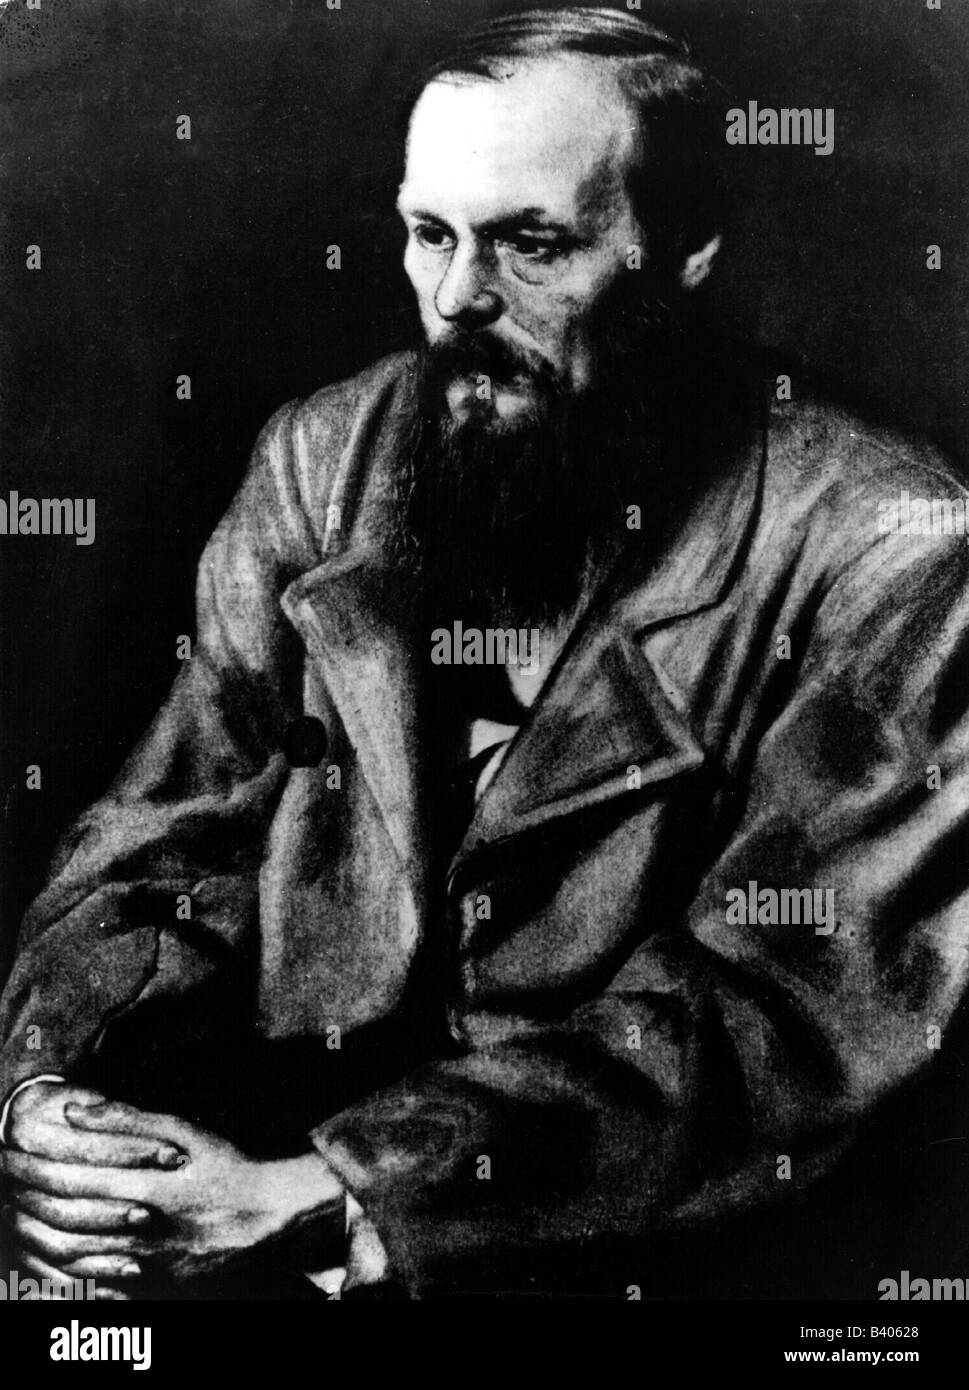 Dostoevsky, Fyodor Mikhailovich, 11.11.1821 - 9.2.1881, Russian writer, novelist, half length, painting, Additional - Stock Image